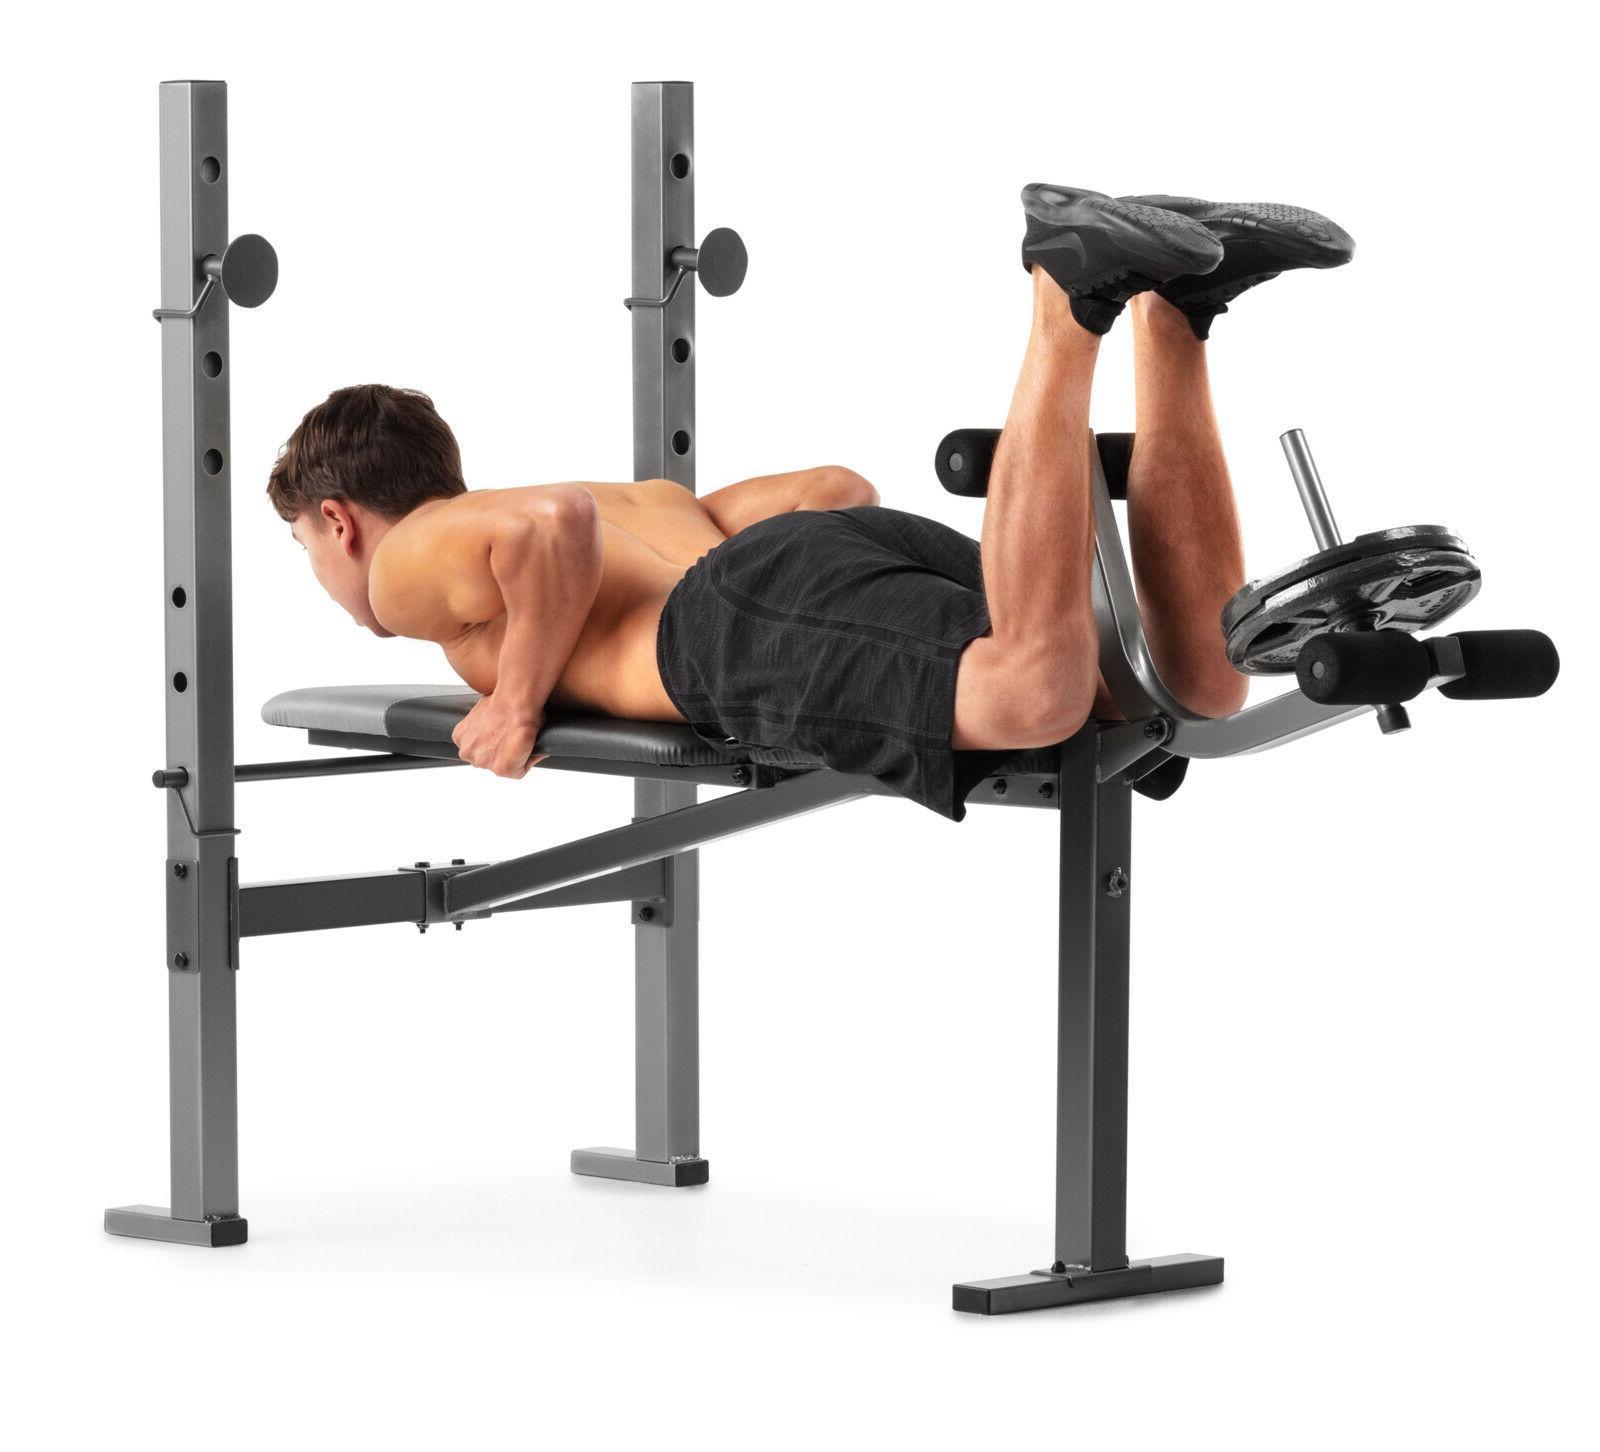 Weider 6.1 Weight Developer Exercise